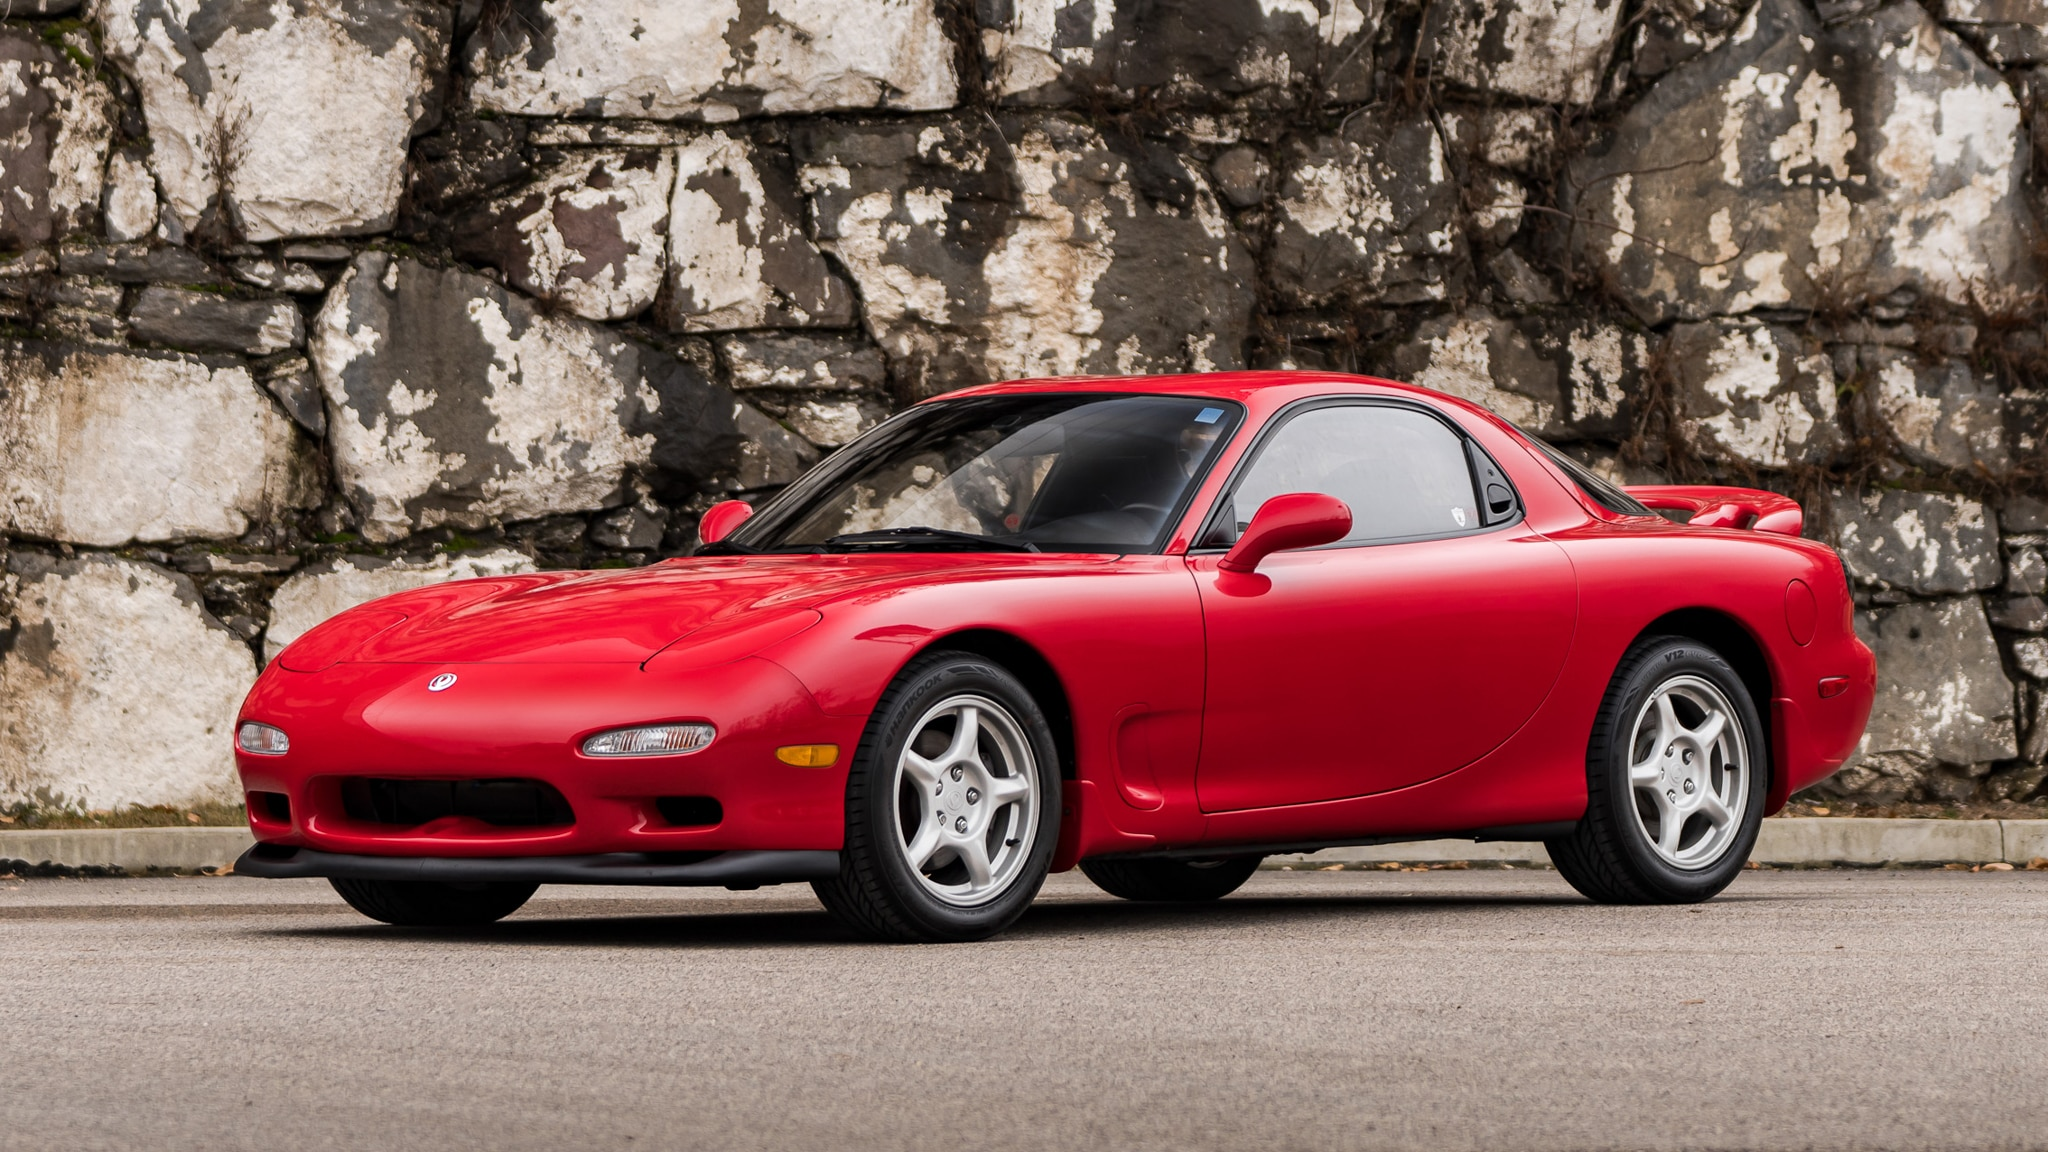 Kelebihan Kekurangan Mazda 7 Review